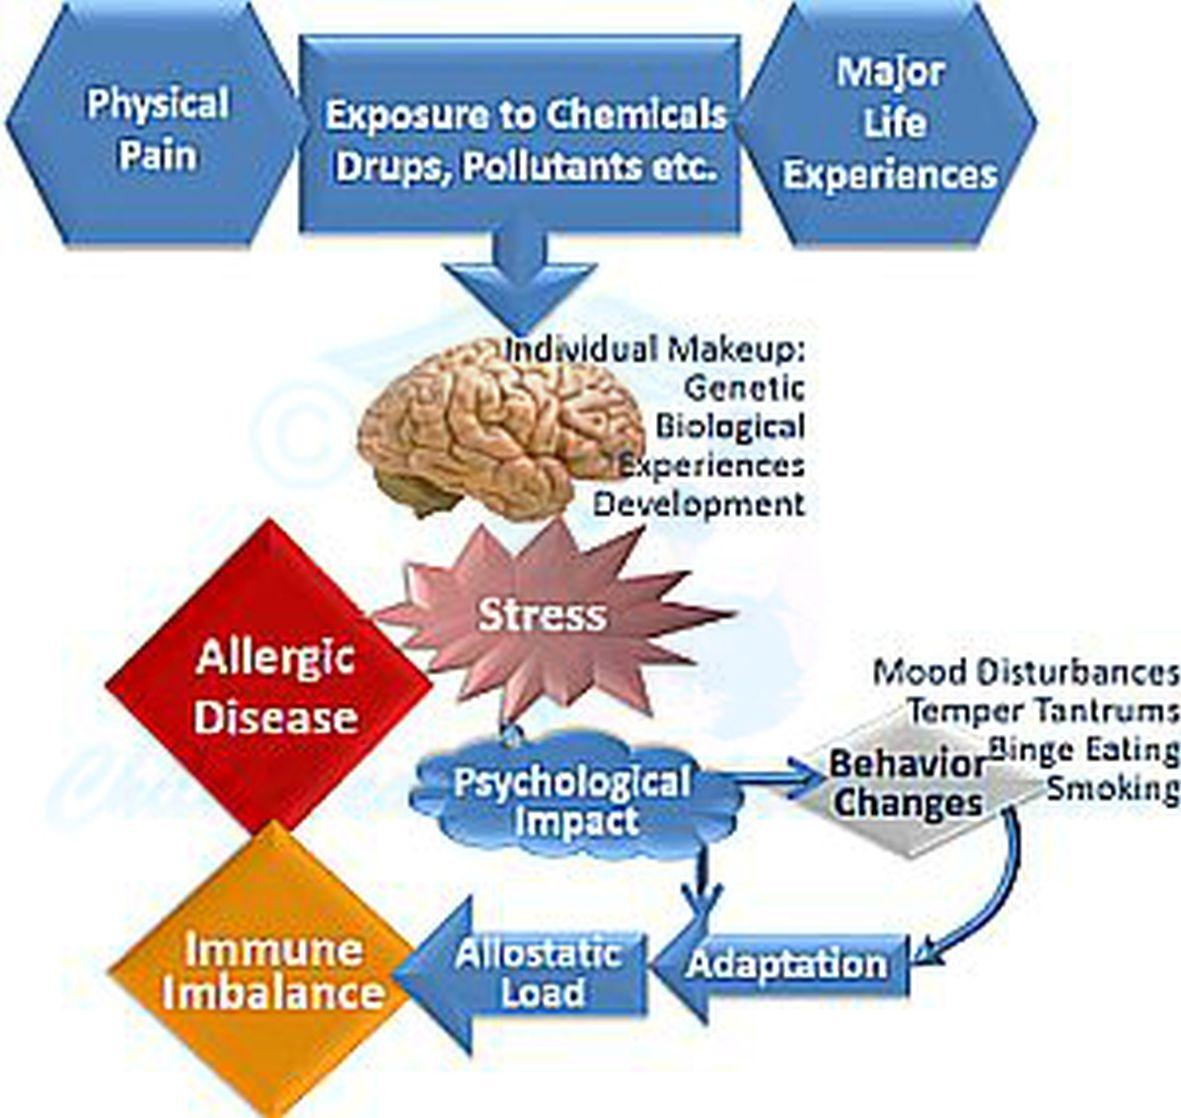 Stress Impairs Immune Balance